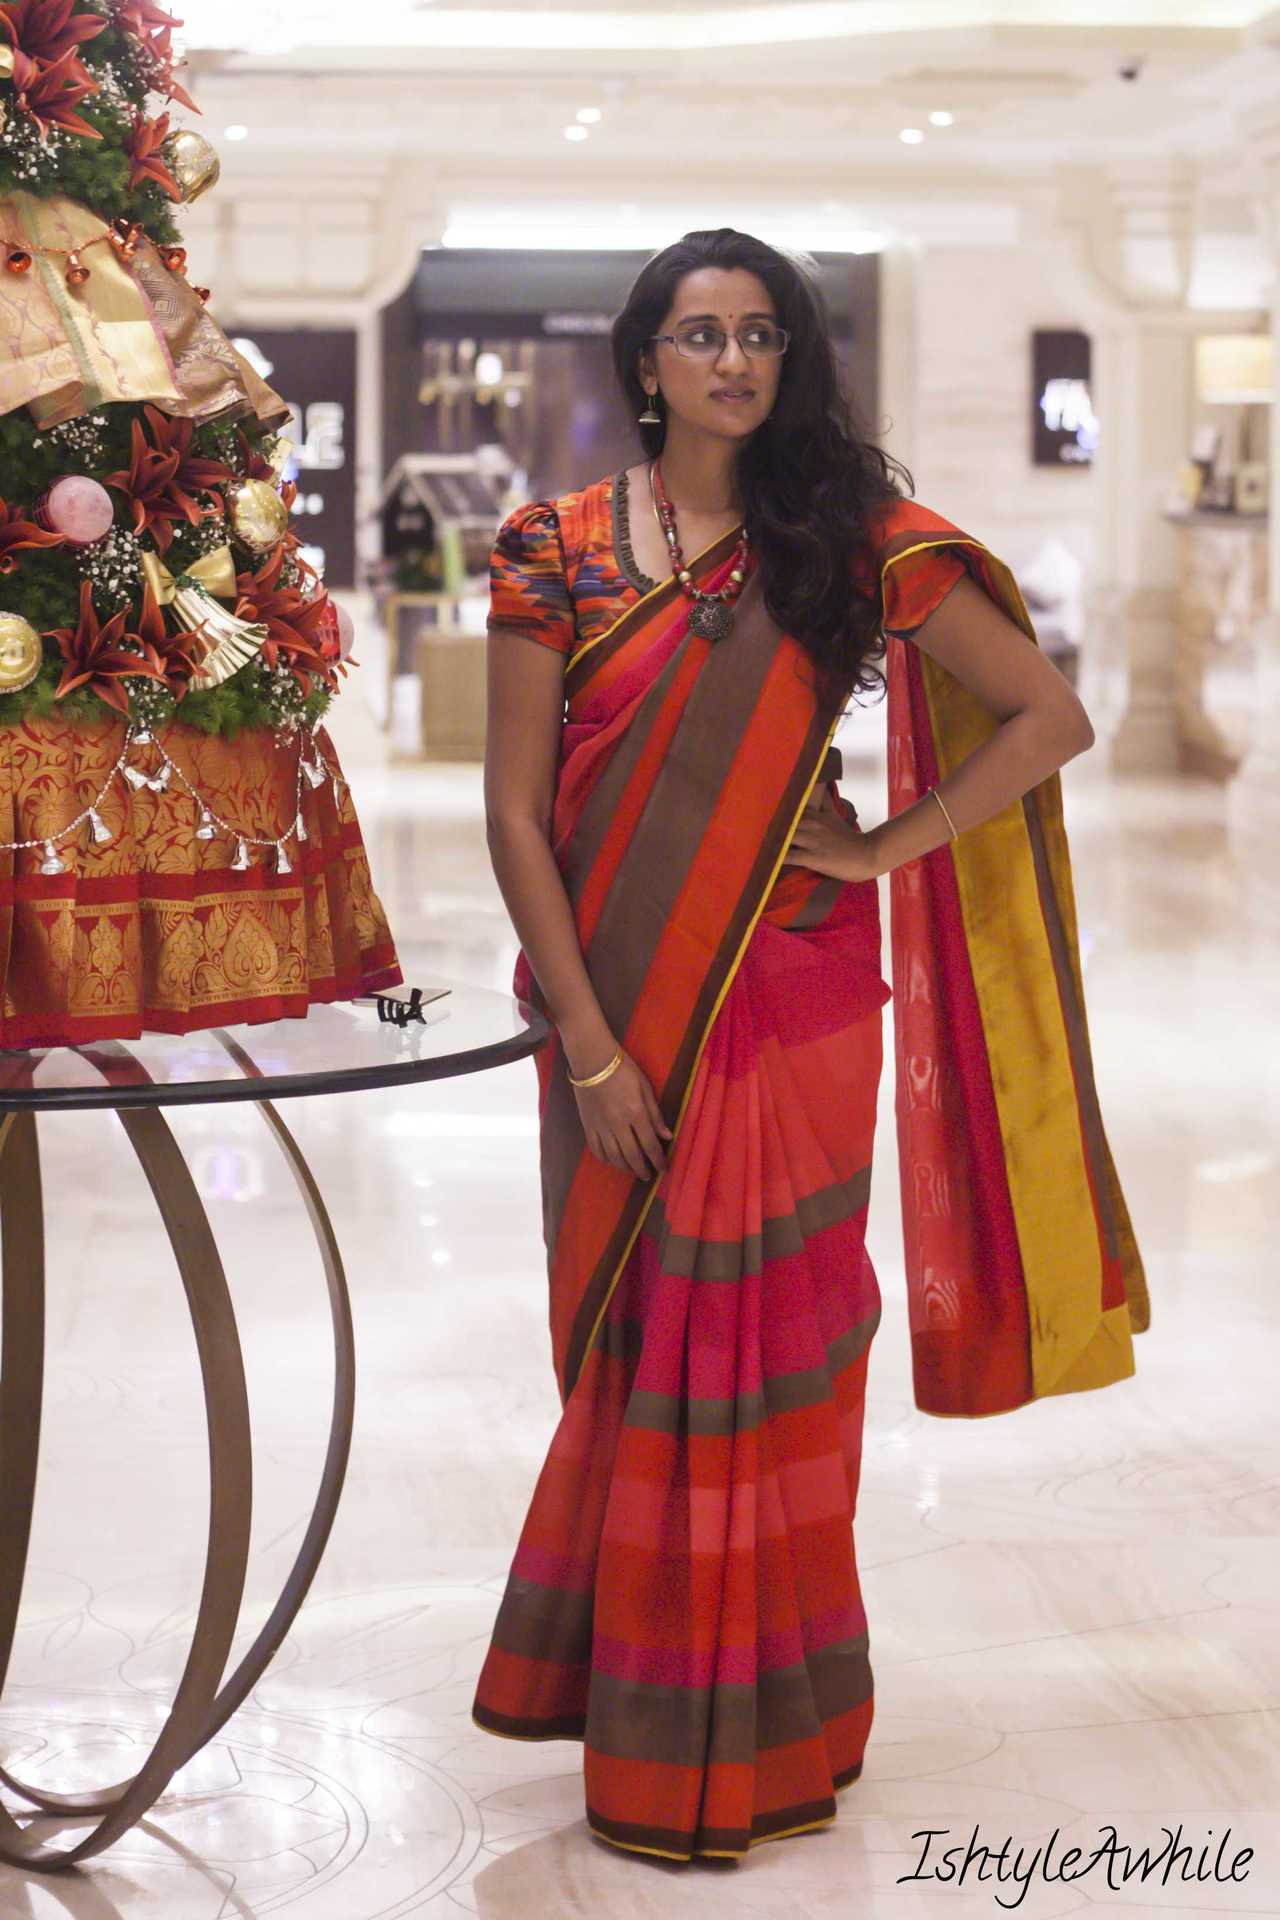 IshtyleAwhile - sari styling by ishtyleawhile